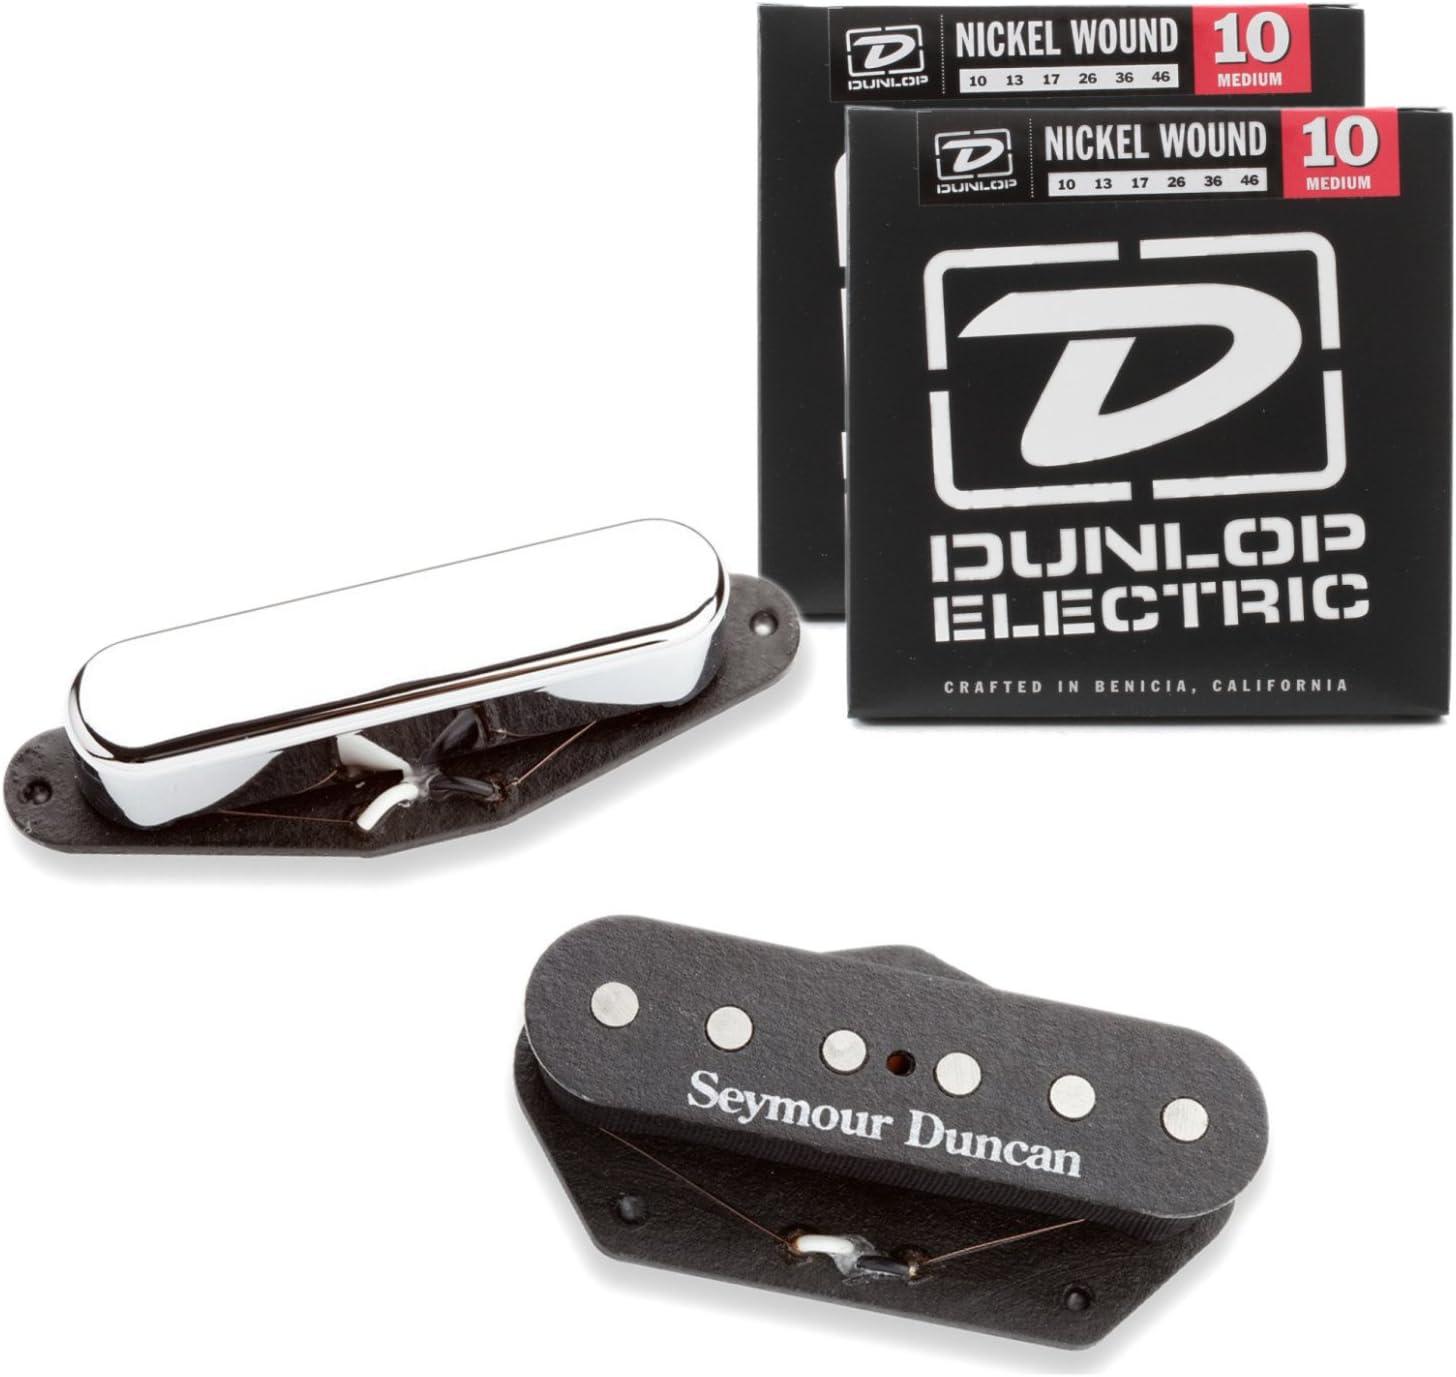 Seymour Duncan Hot Tele Alnico 5 Telecaster Guitar Pickup Set 3 STRING SETS